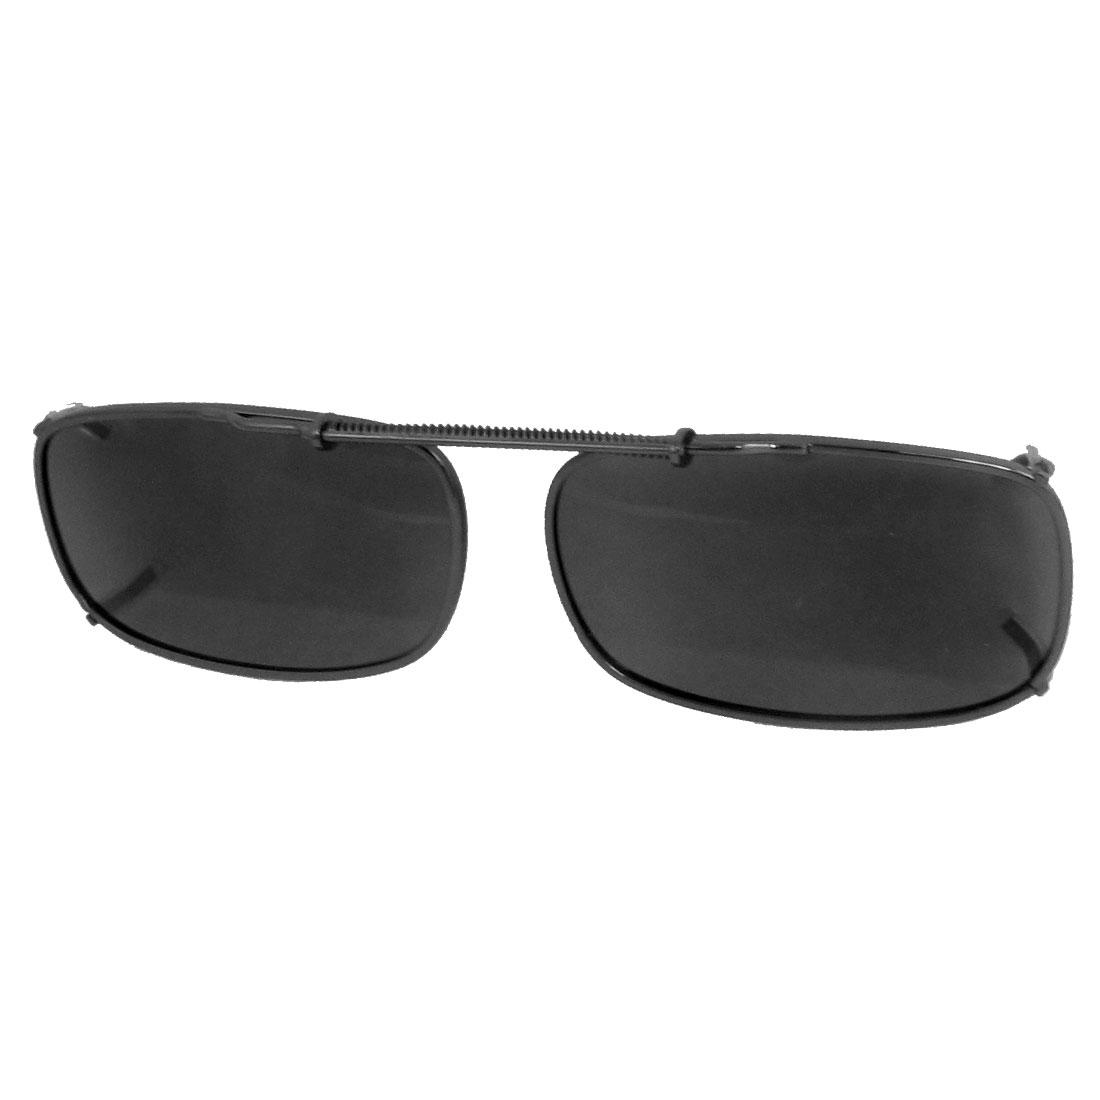 Unisex Gray Lens Full Frame Traveling Clip On Polarized Eyewear Sunglasses